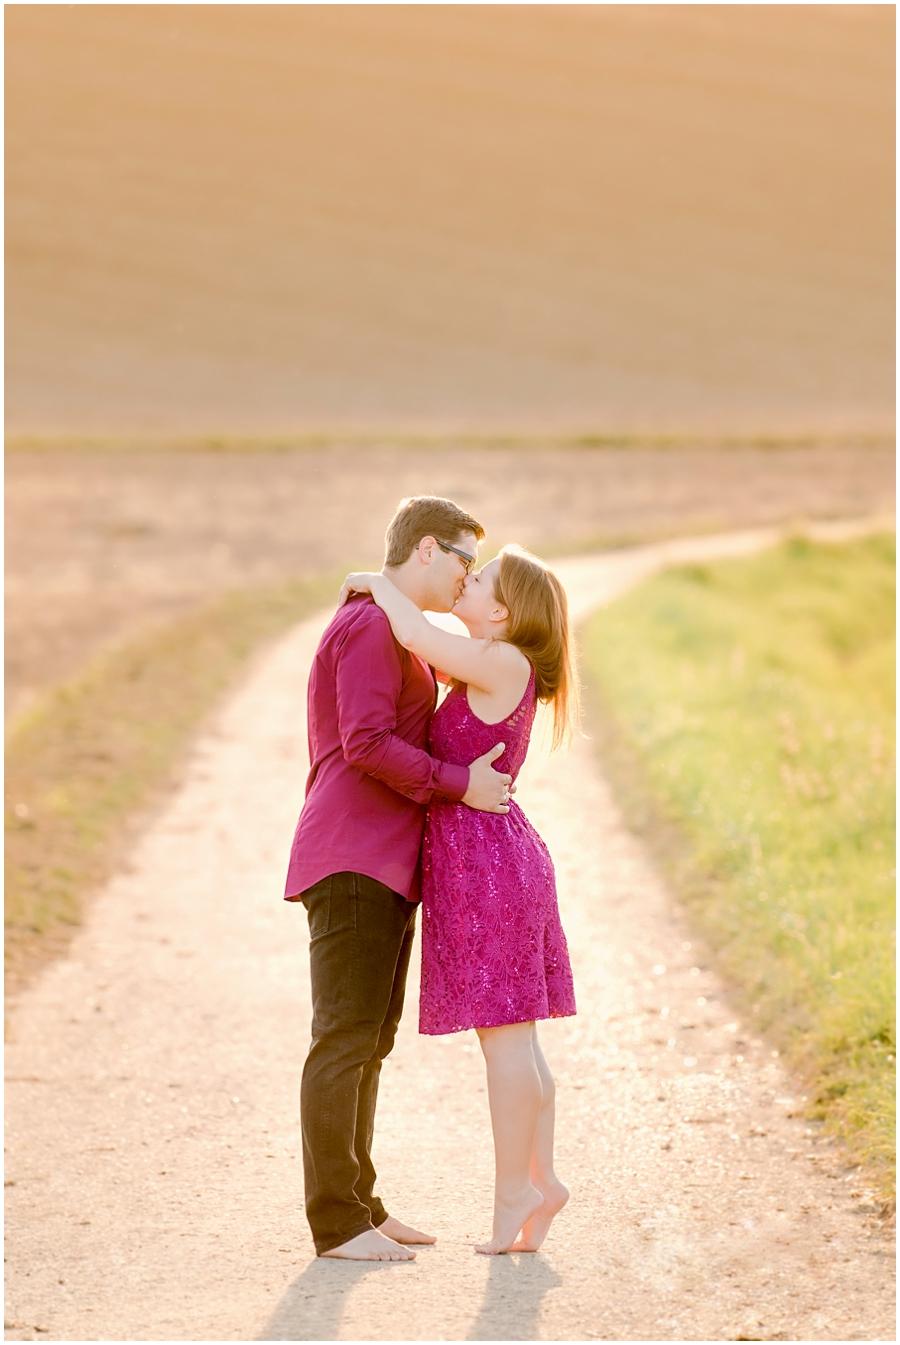 Verlobungsshooting-Paarshooting-Monja-Kantenwein-Fotografin-Pforzheim